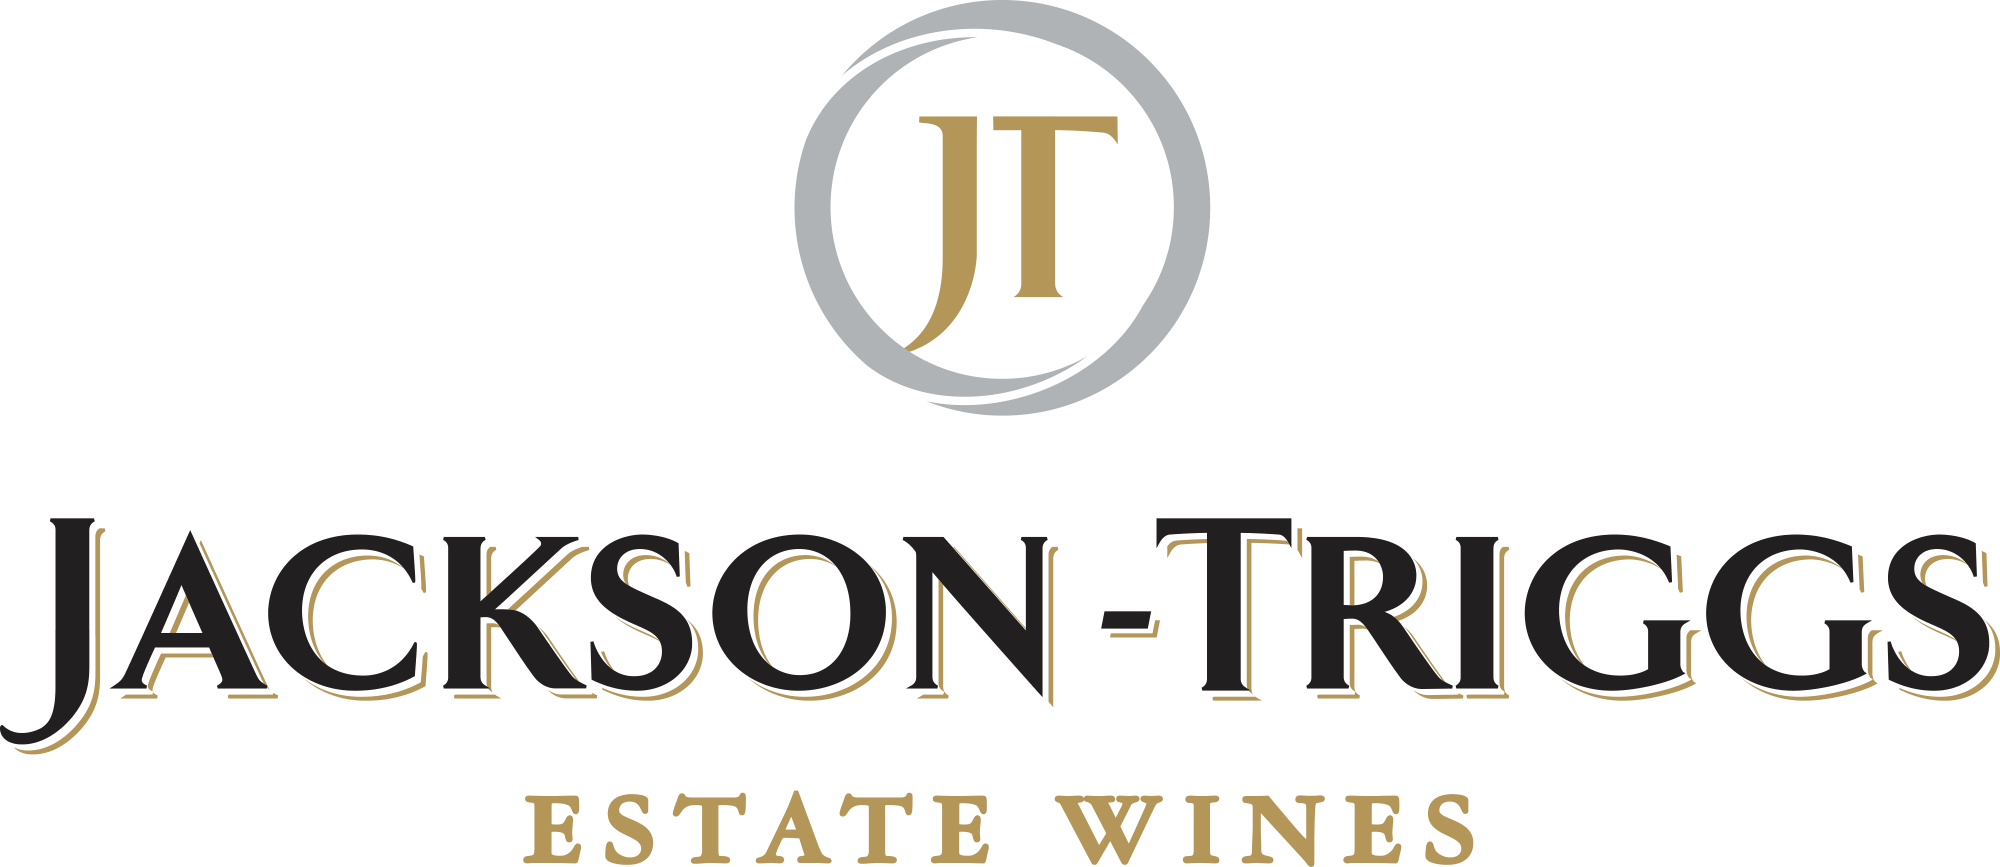 Jackson Triggs logo